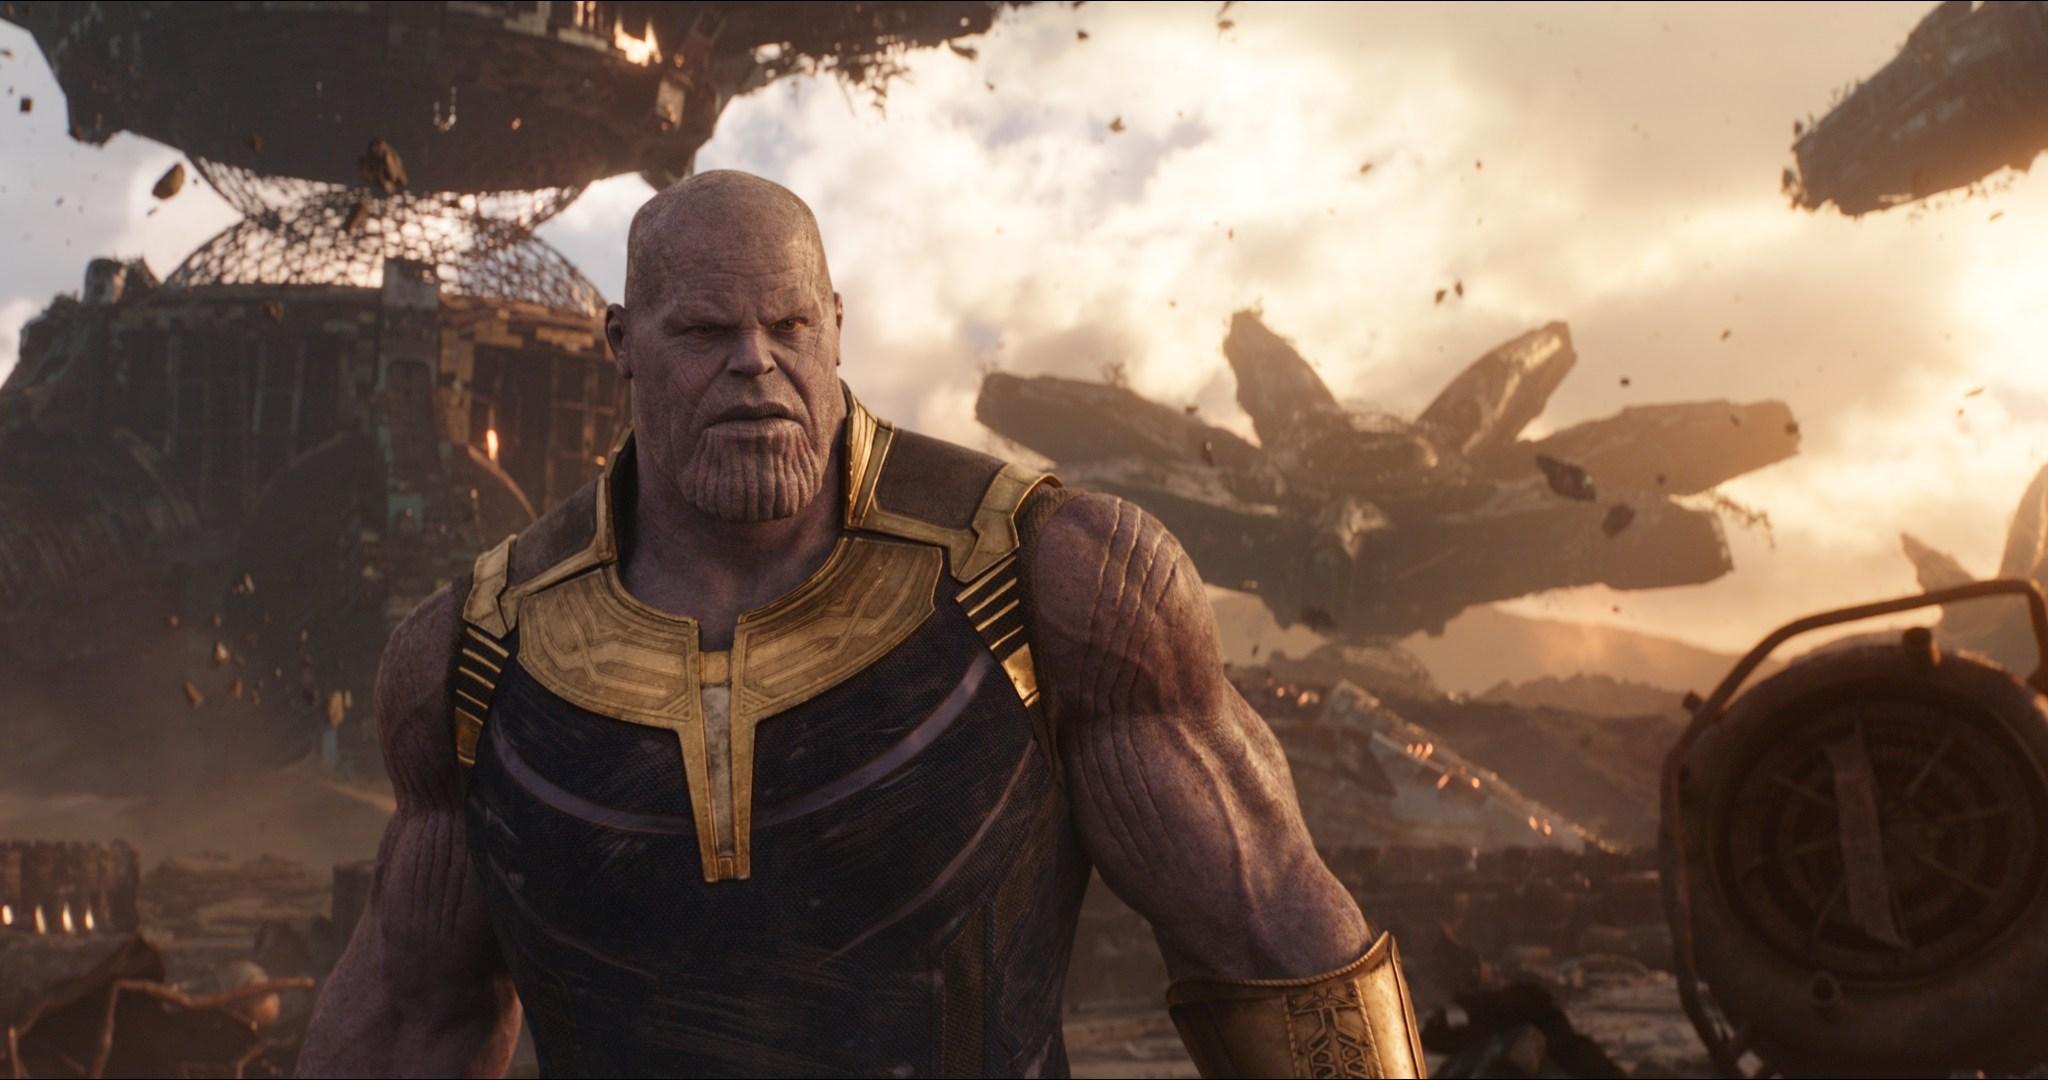 Thanos In Avengers Infinity War - Avengers Infinity War Thanos - Wallpapers, 4k